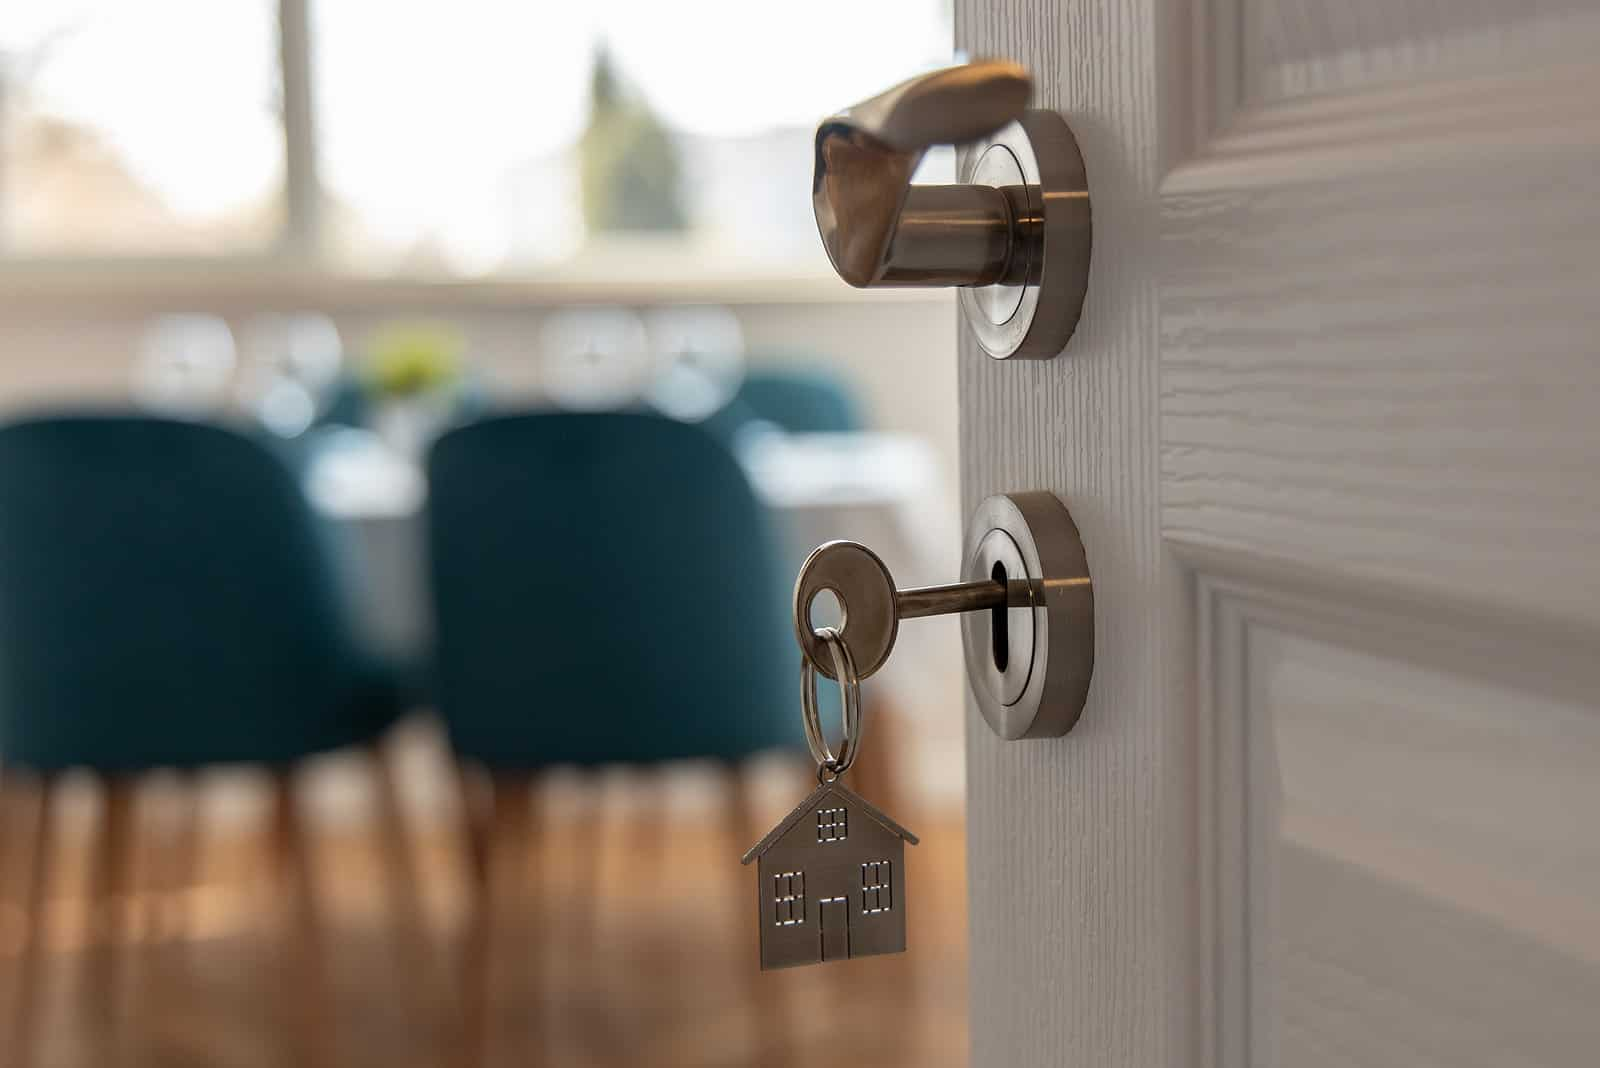 key in door with metal house keychain